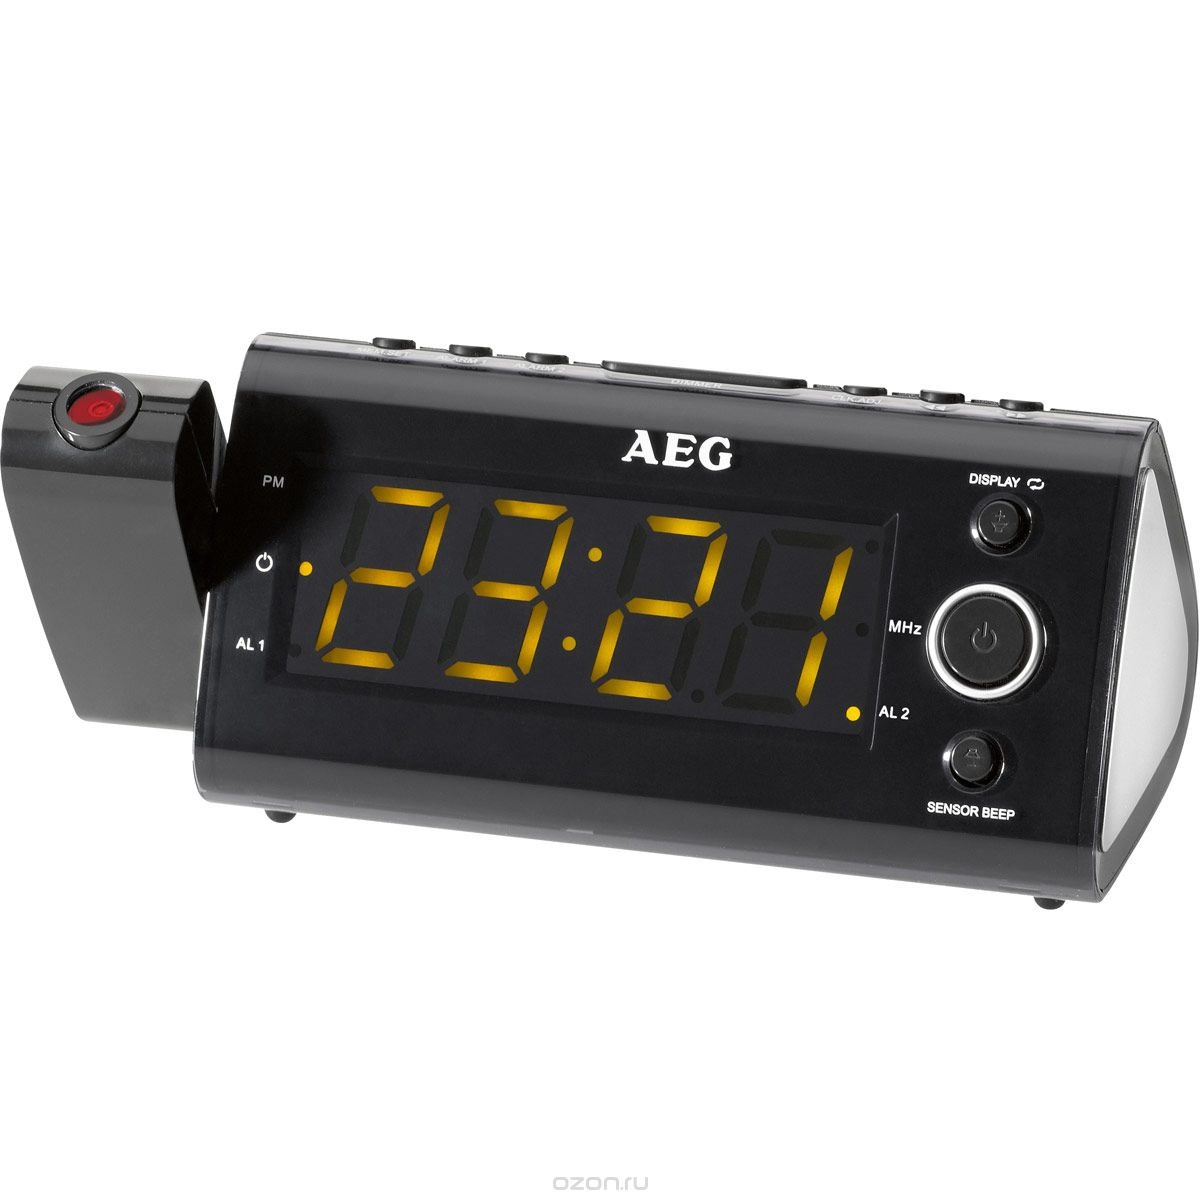 AEG MRC 4121 P Sensor, Black радиочасы